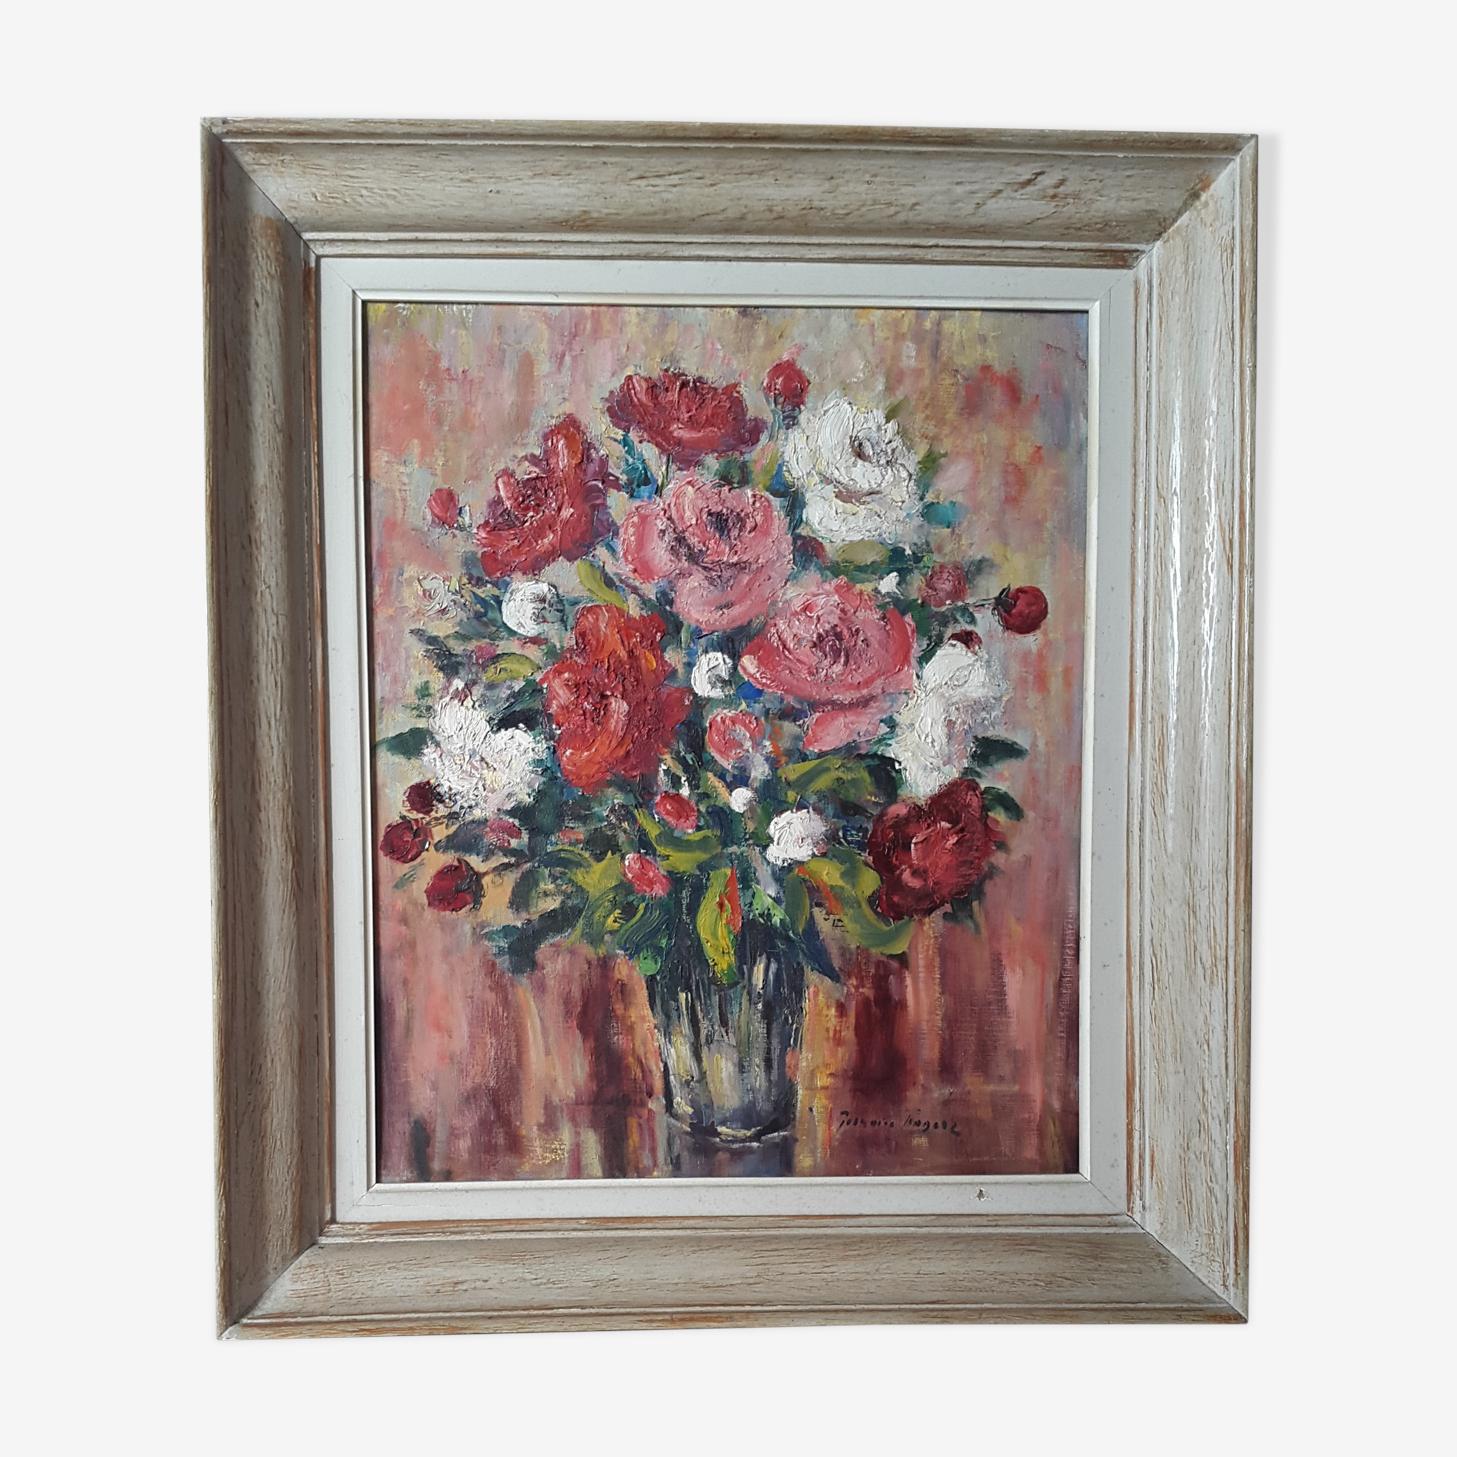 Oil on canvas Germaine Francoz